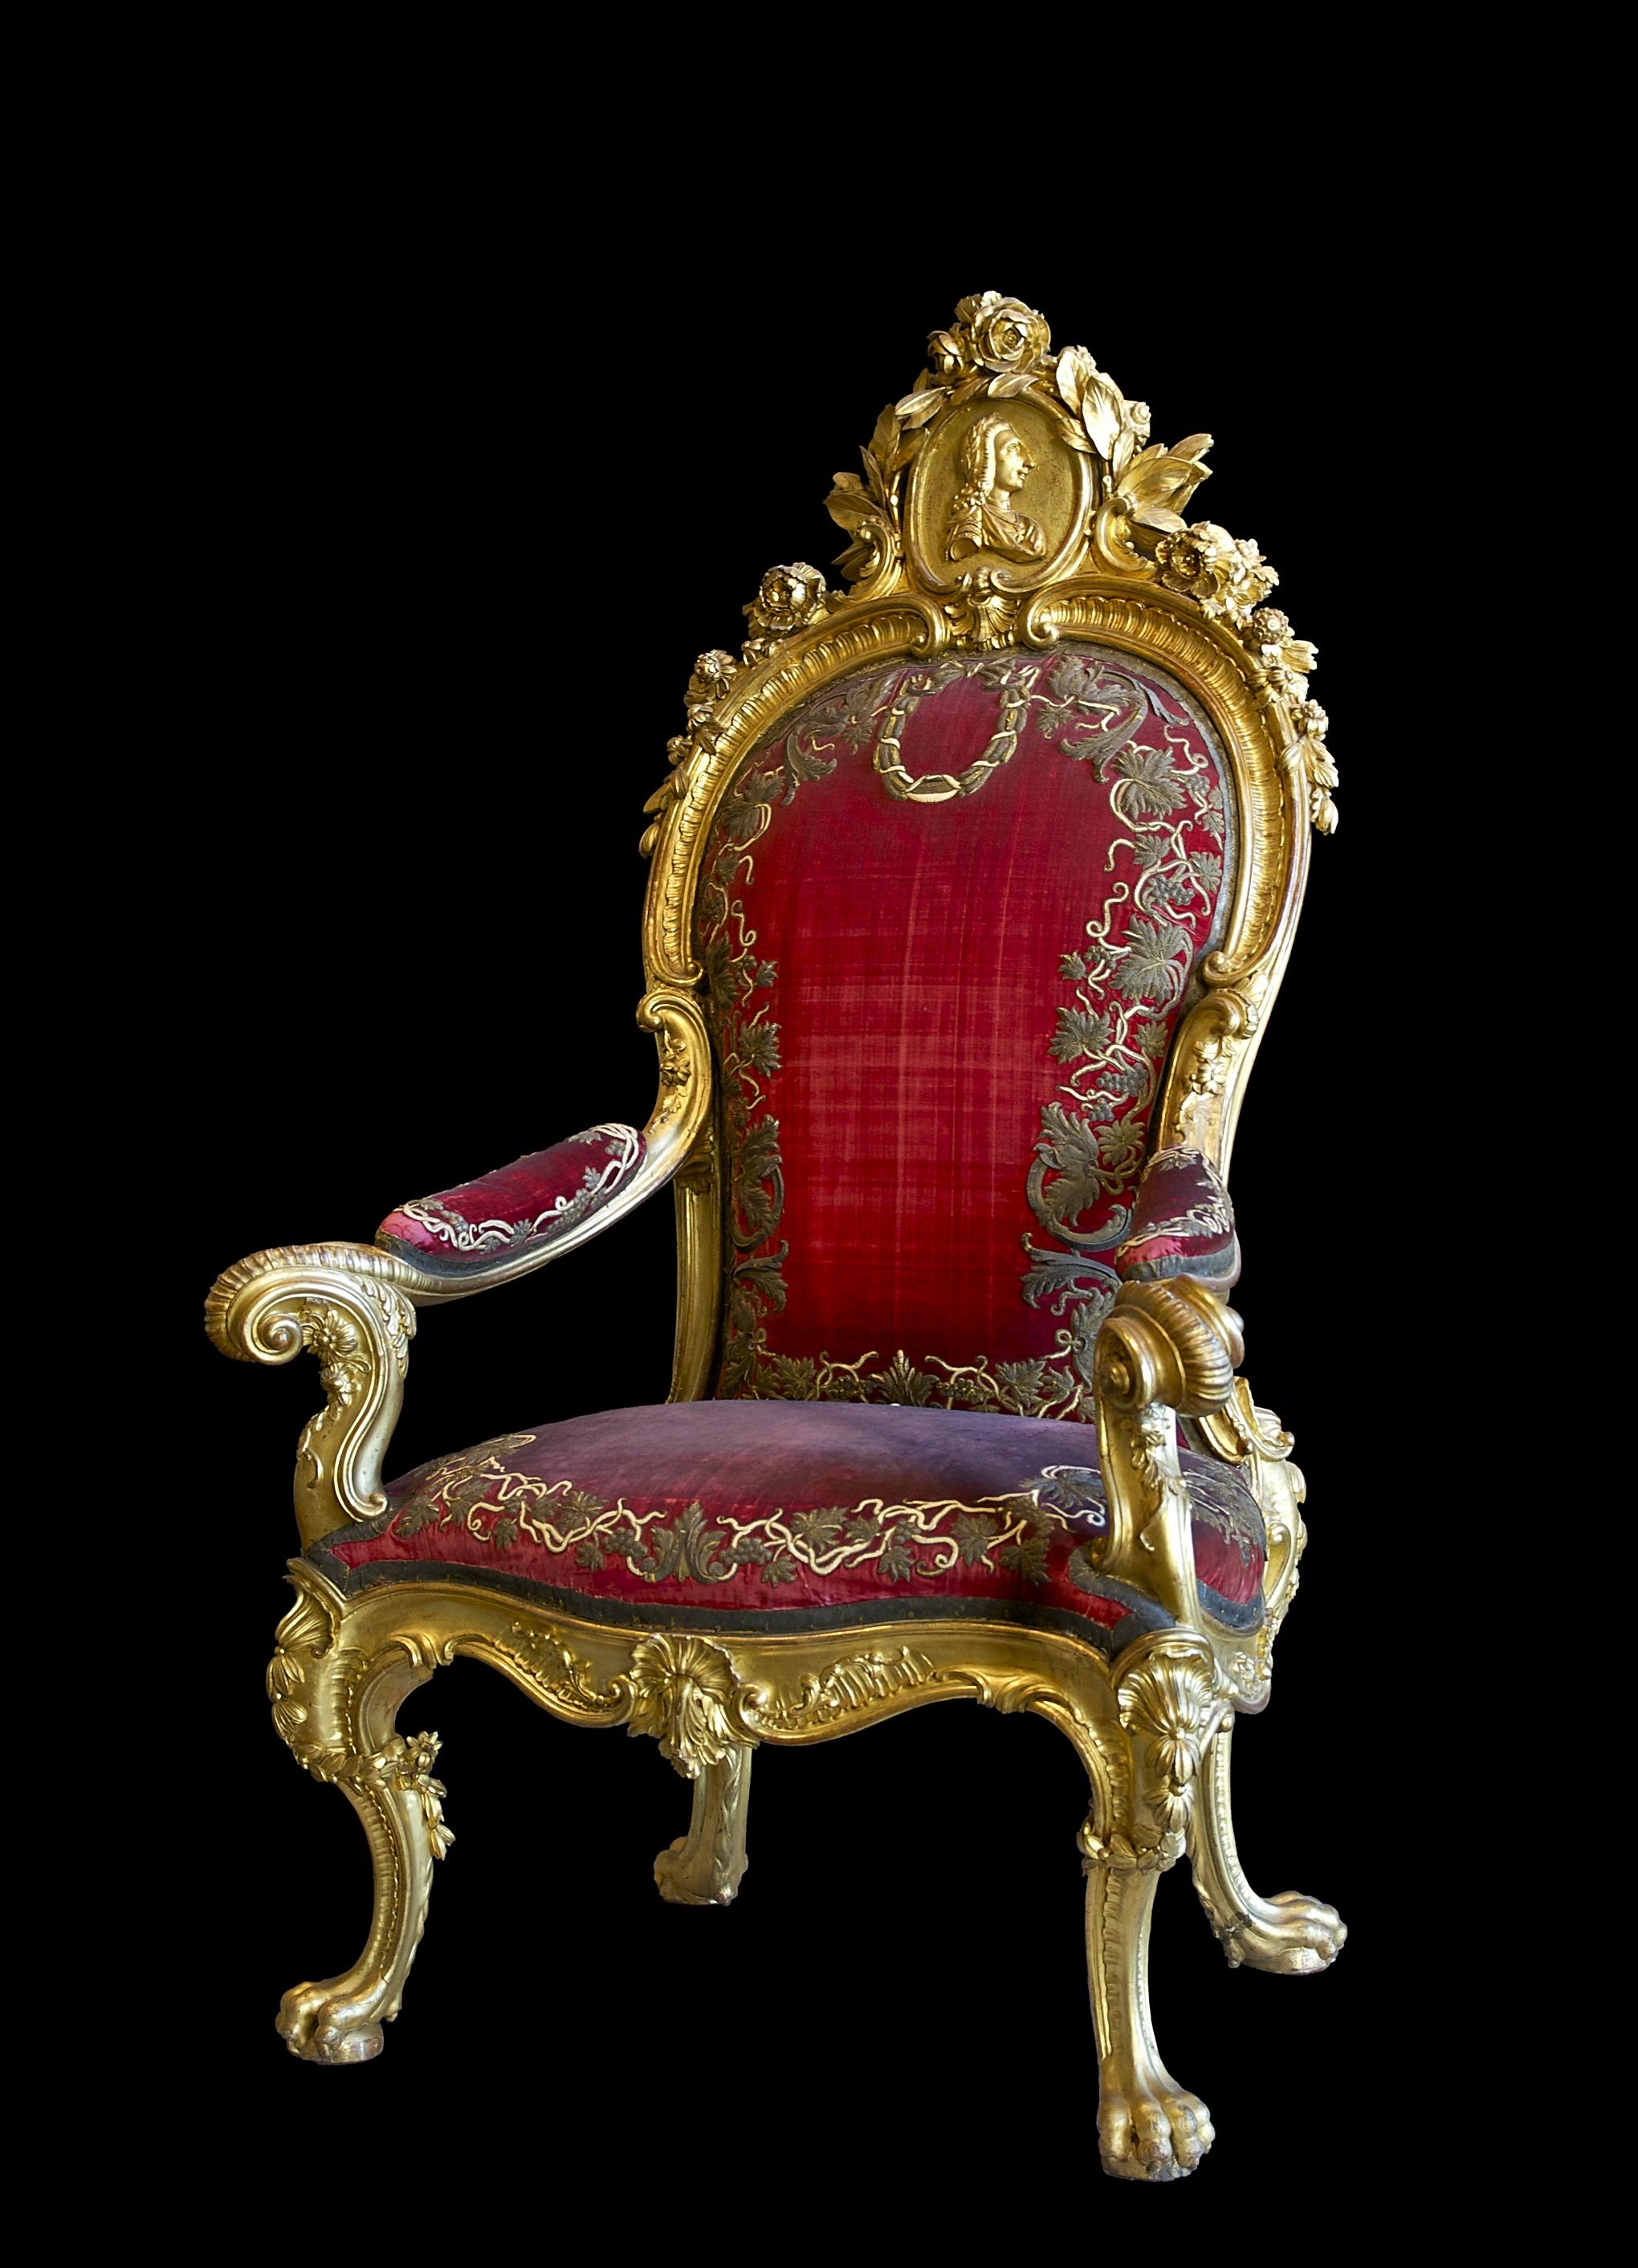 chair-statue-museum-macro-artistic-landmark-1248318-pxhere.com.jpg